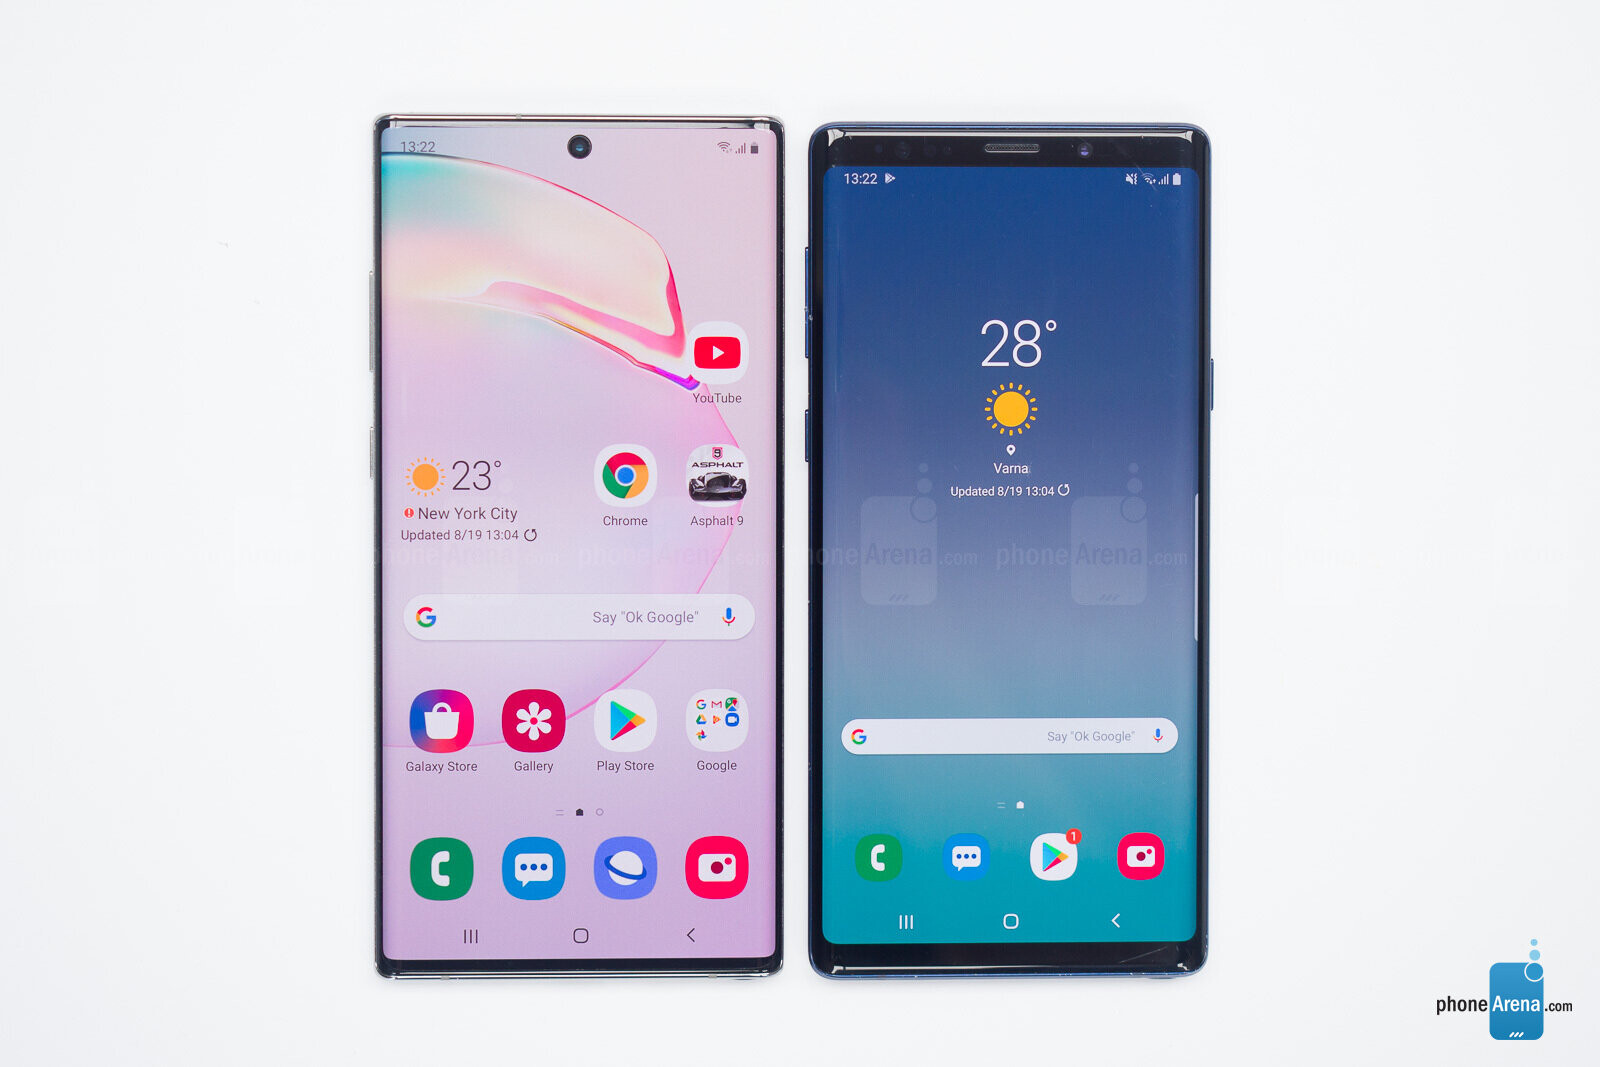 Samsung Galaxy Note 10+ vs Galaxy Note 9 - PhoneArena